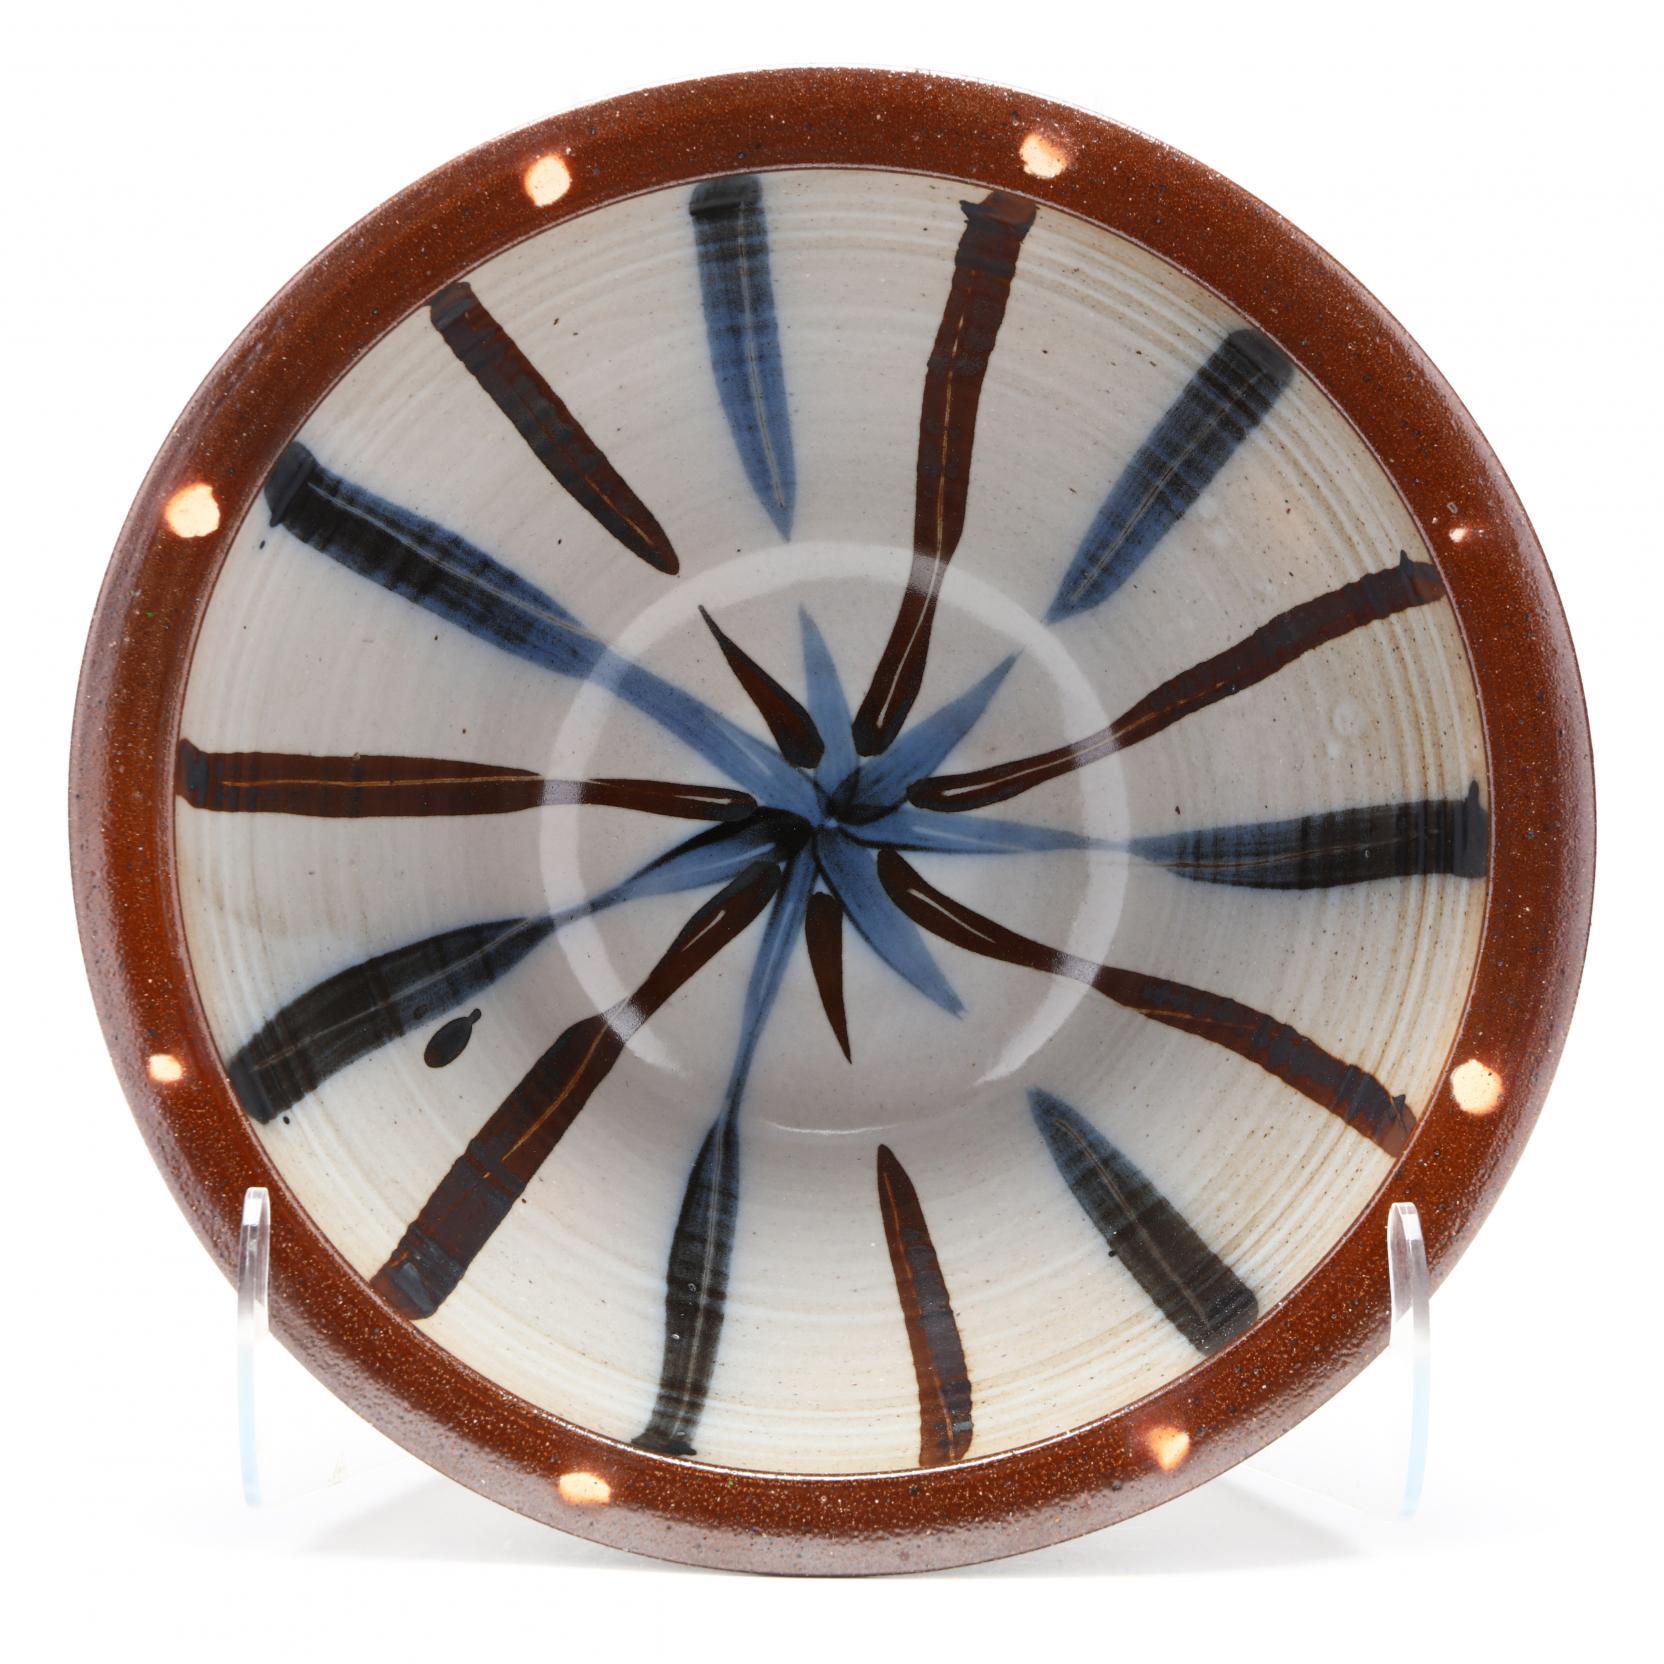 a-large-center-bowl-mark-hewitt-pottery